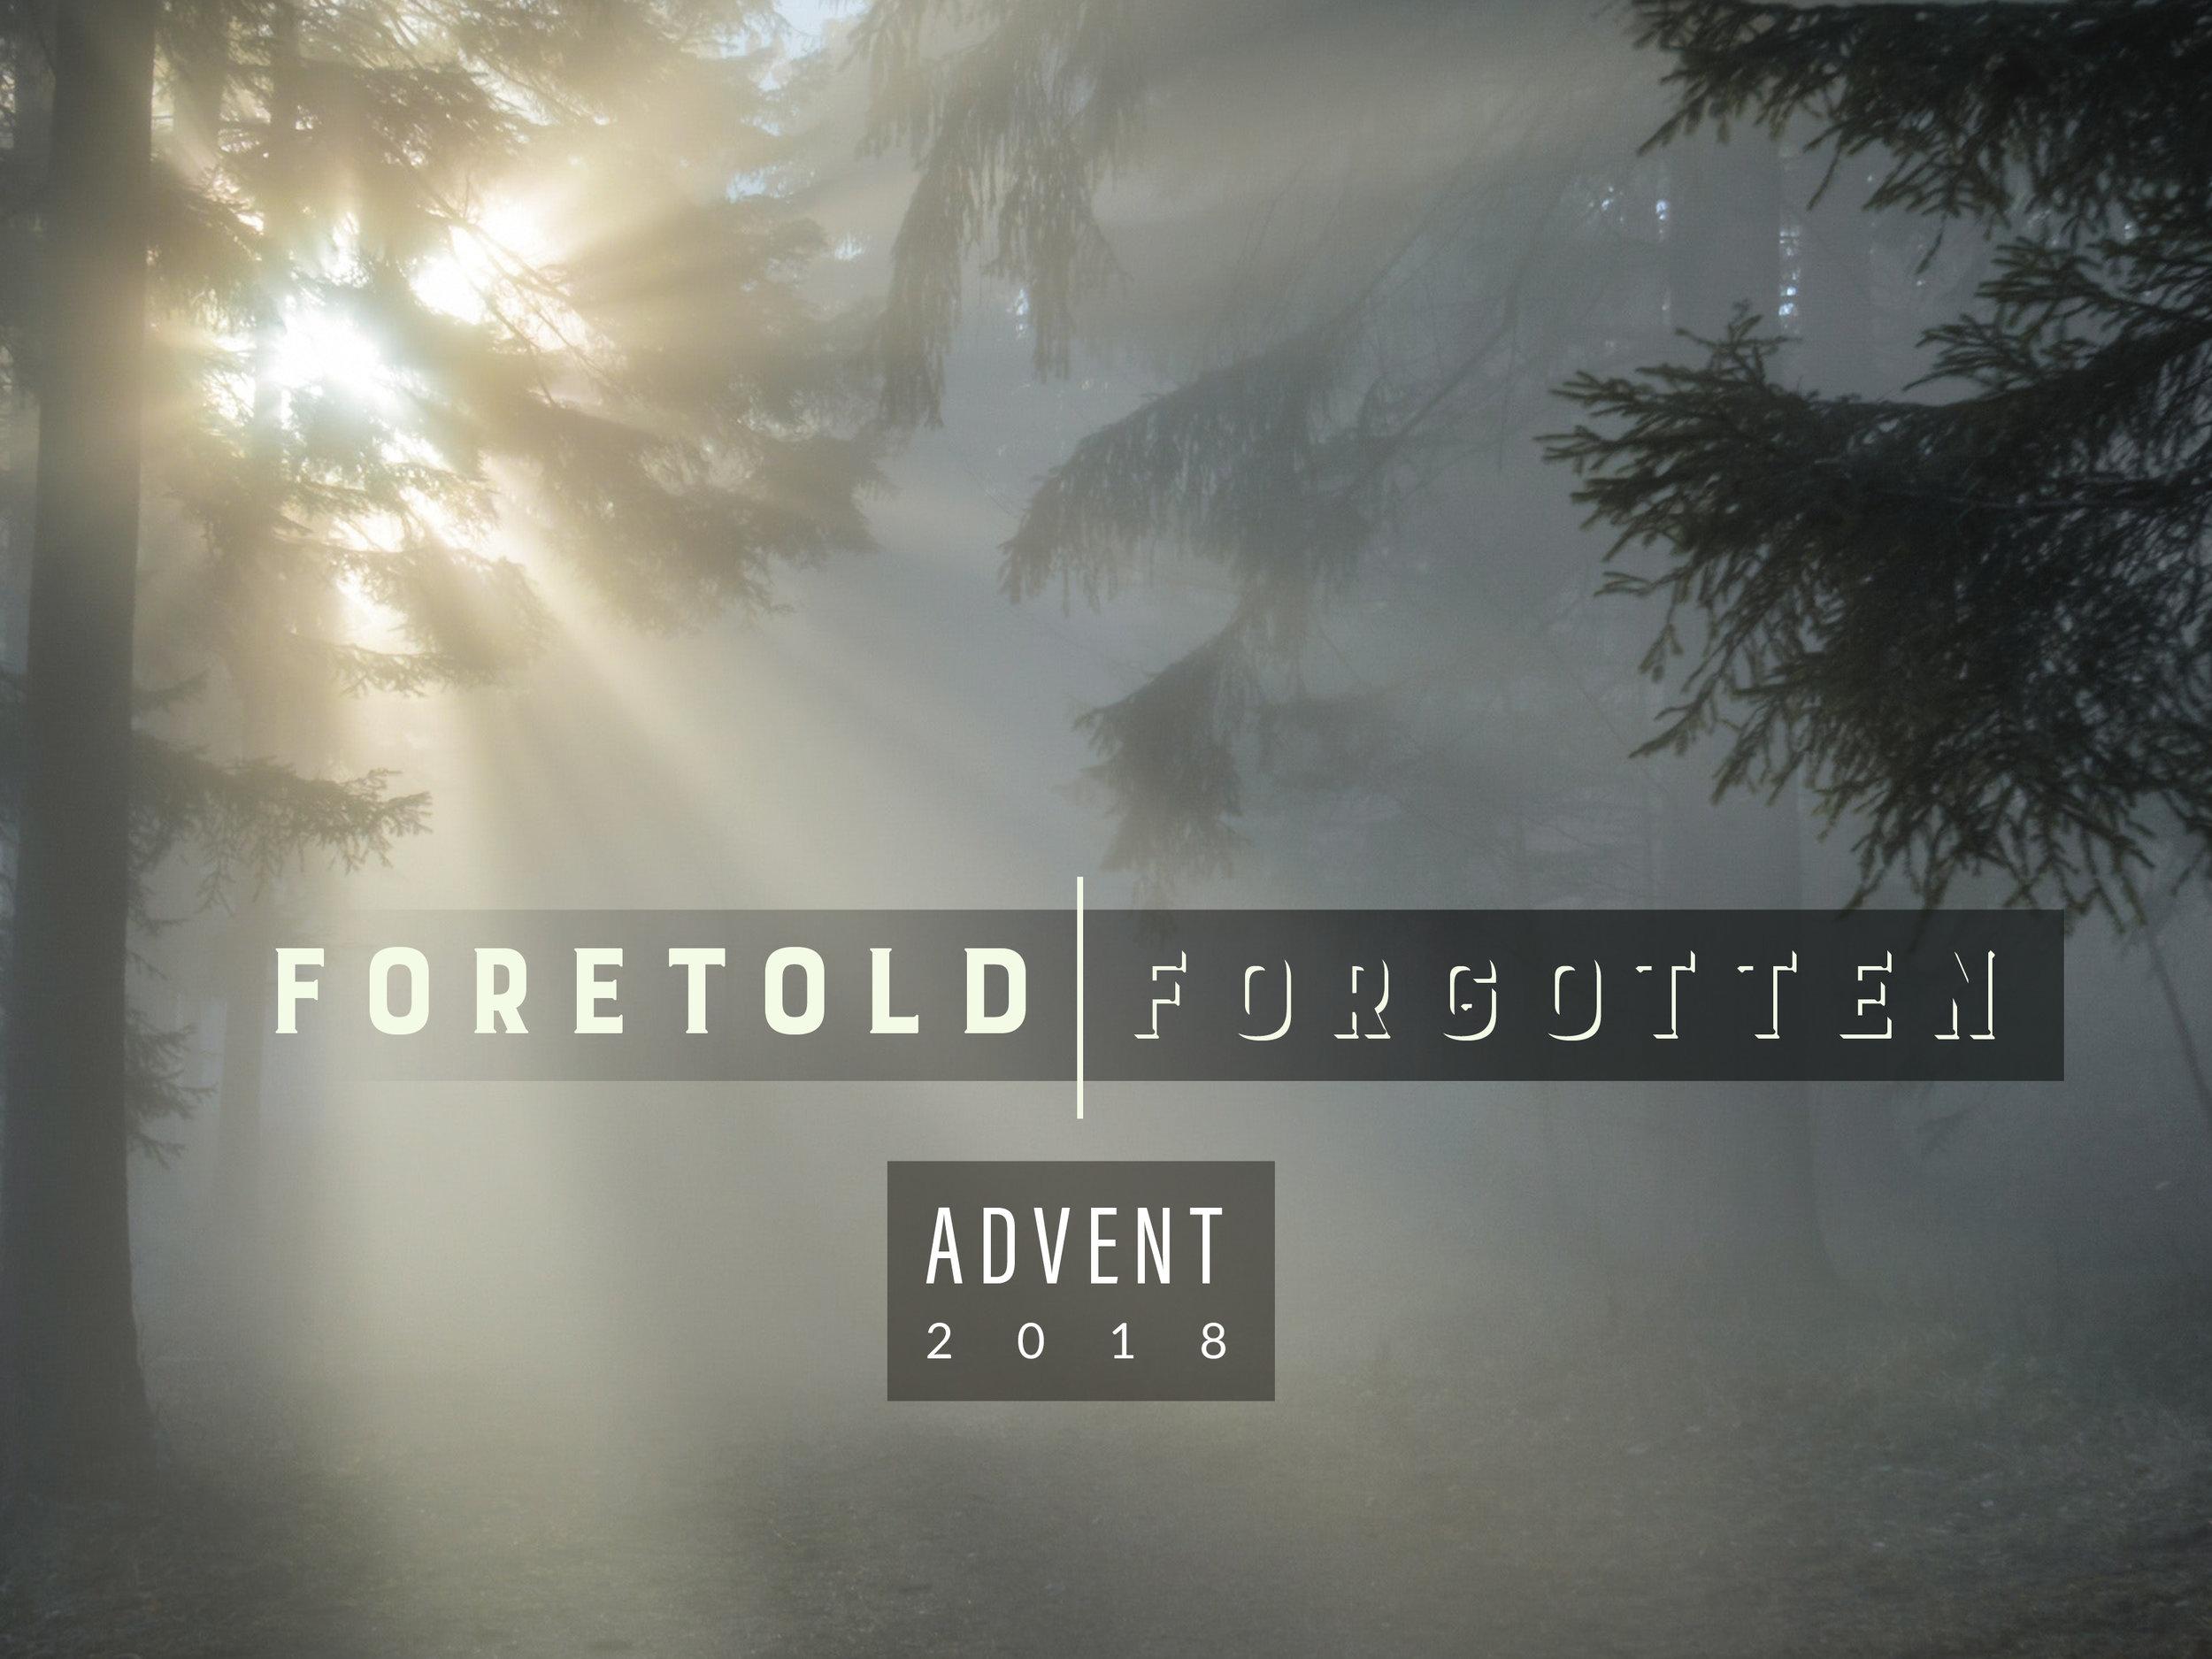 Advent 2018:  Foretold | Forgotten